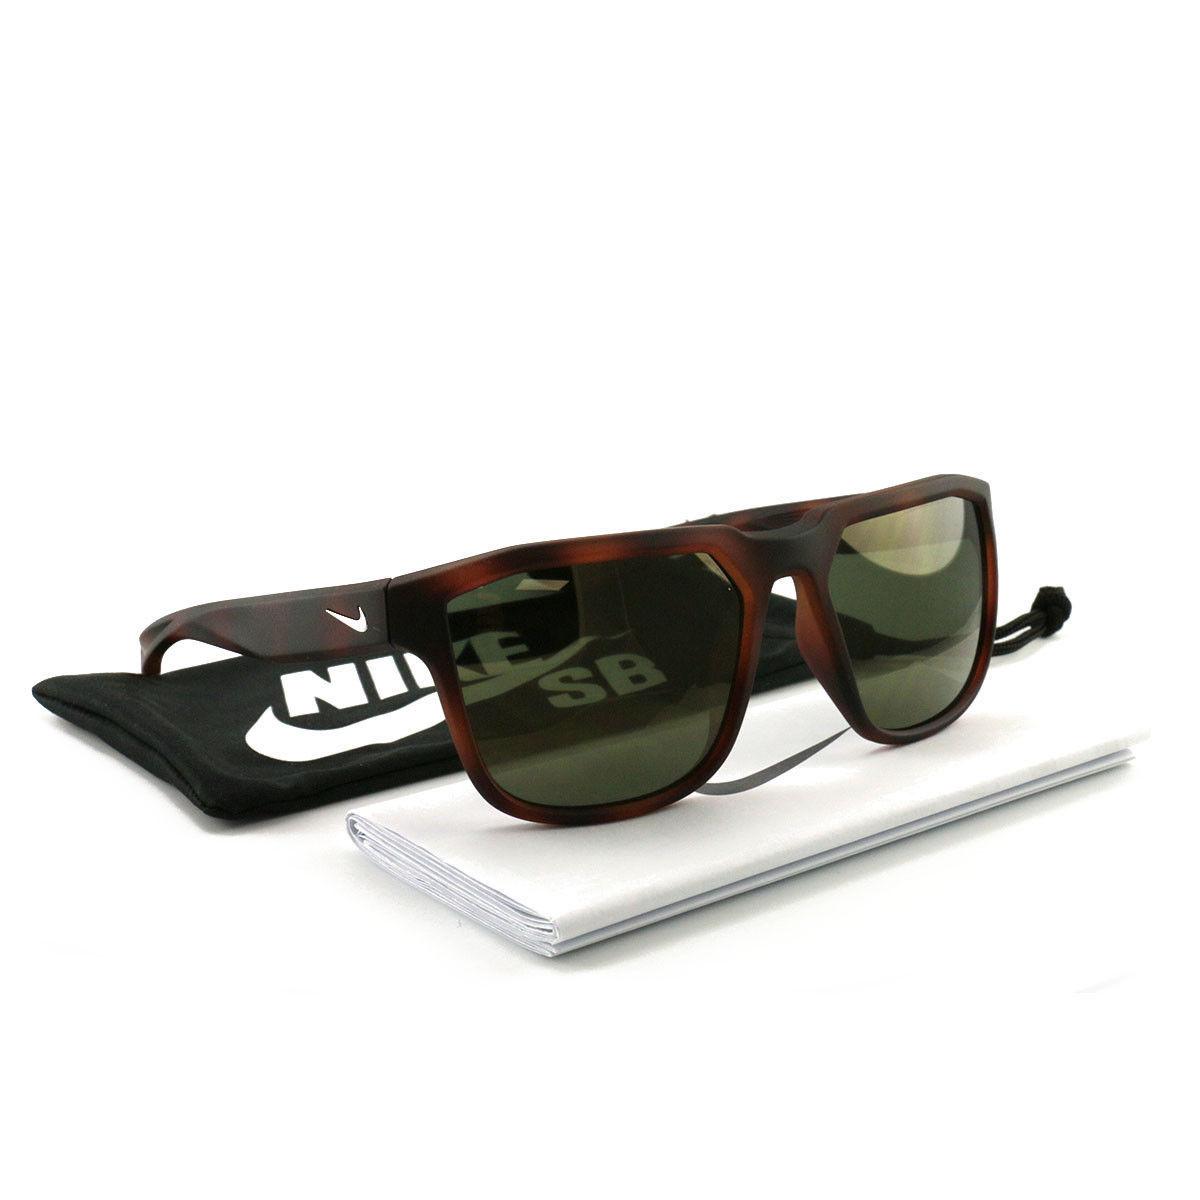 664c39b6c8f Nike Fly Sunglasses EV0927 205 Matte Tortoise Gren Gun 57 18 150 -  59.90